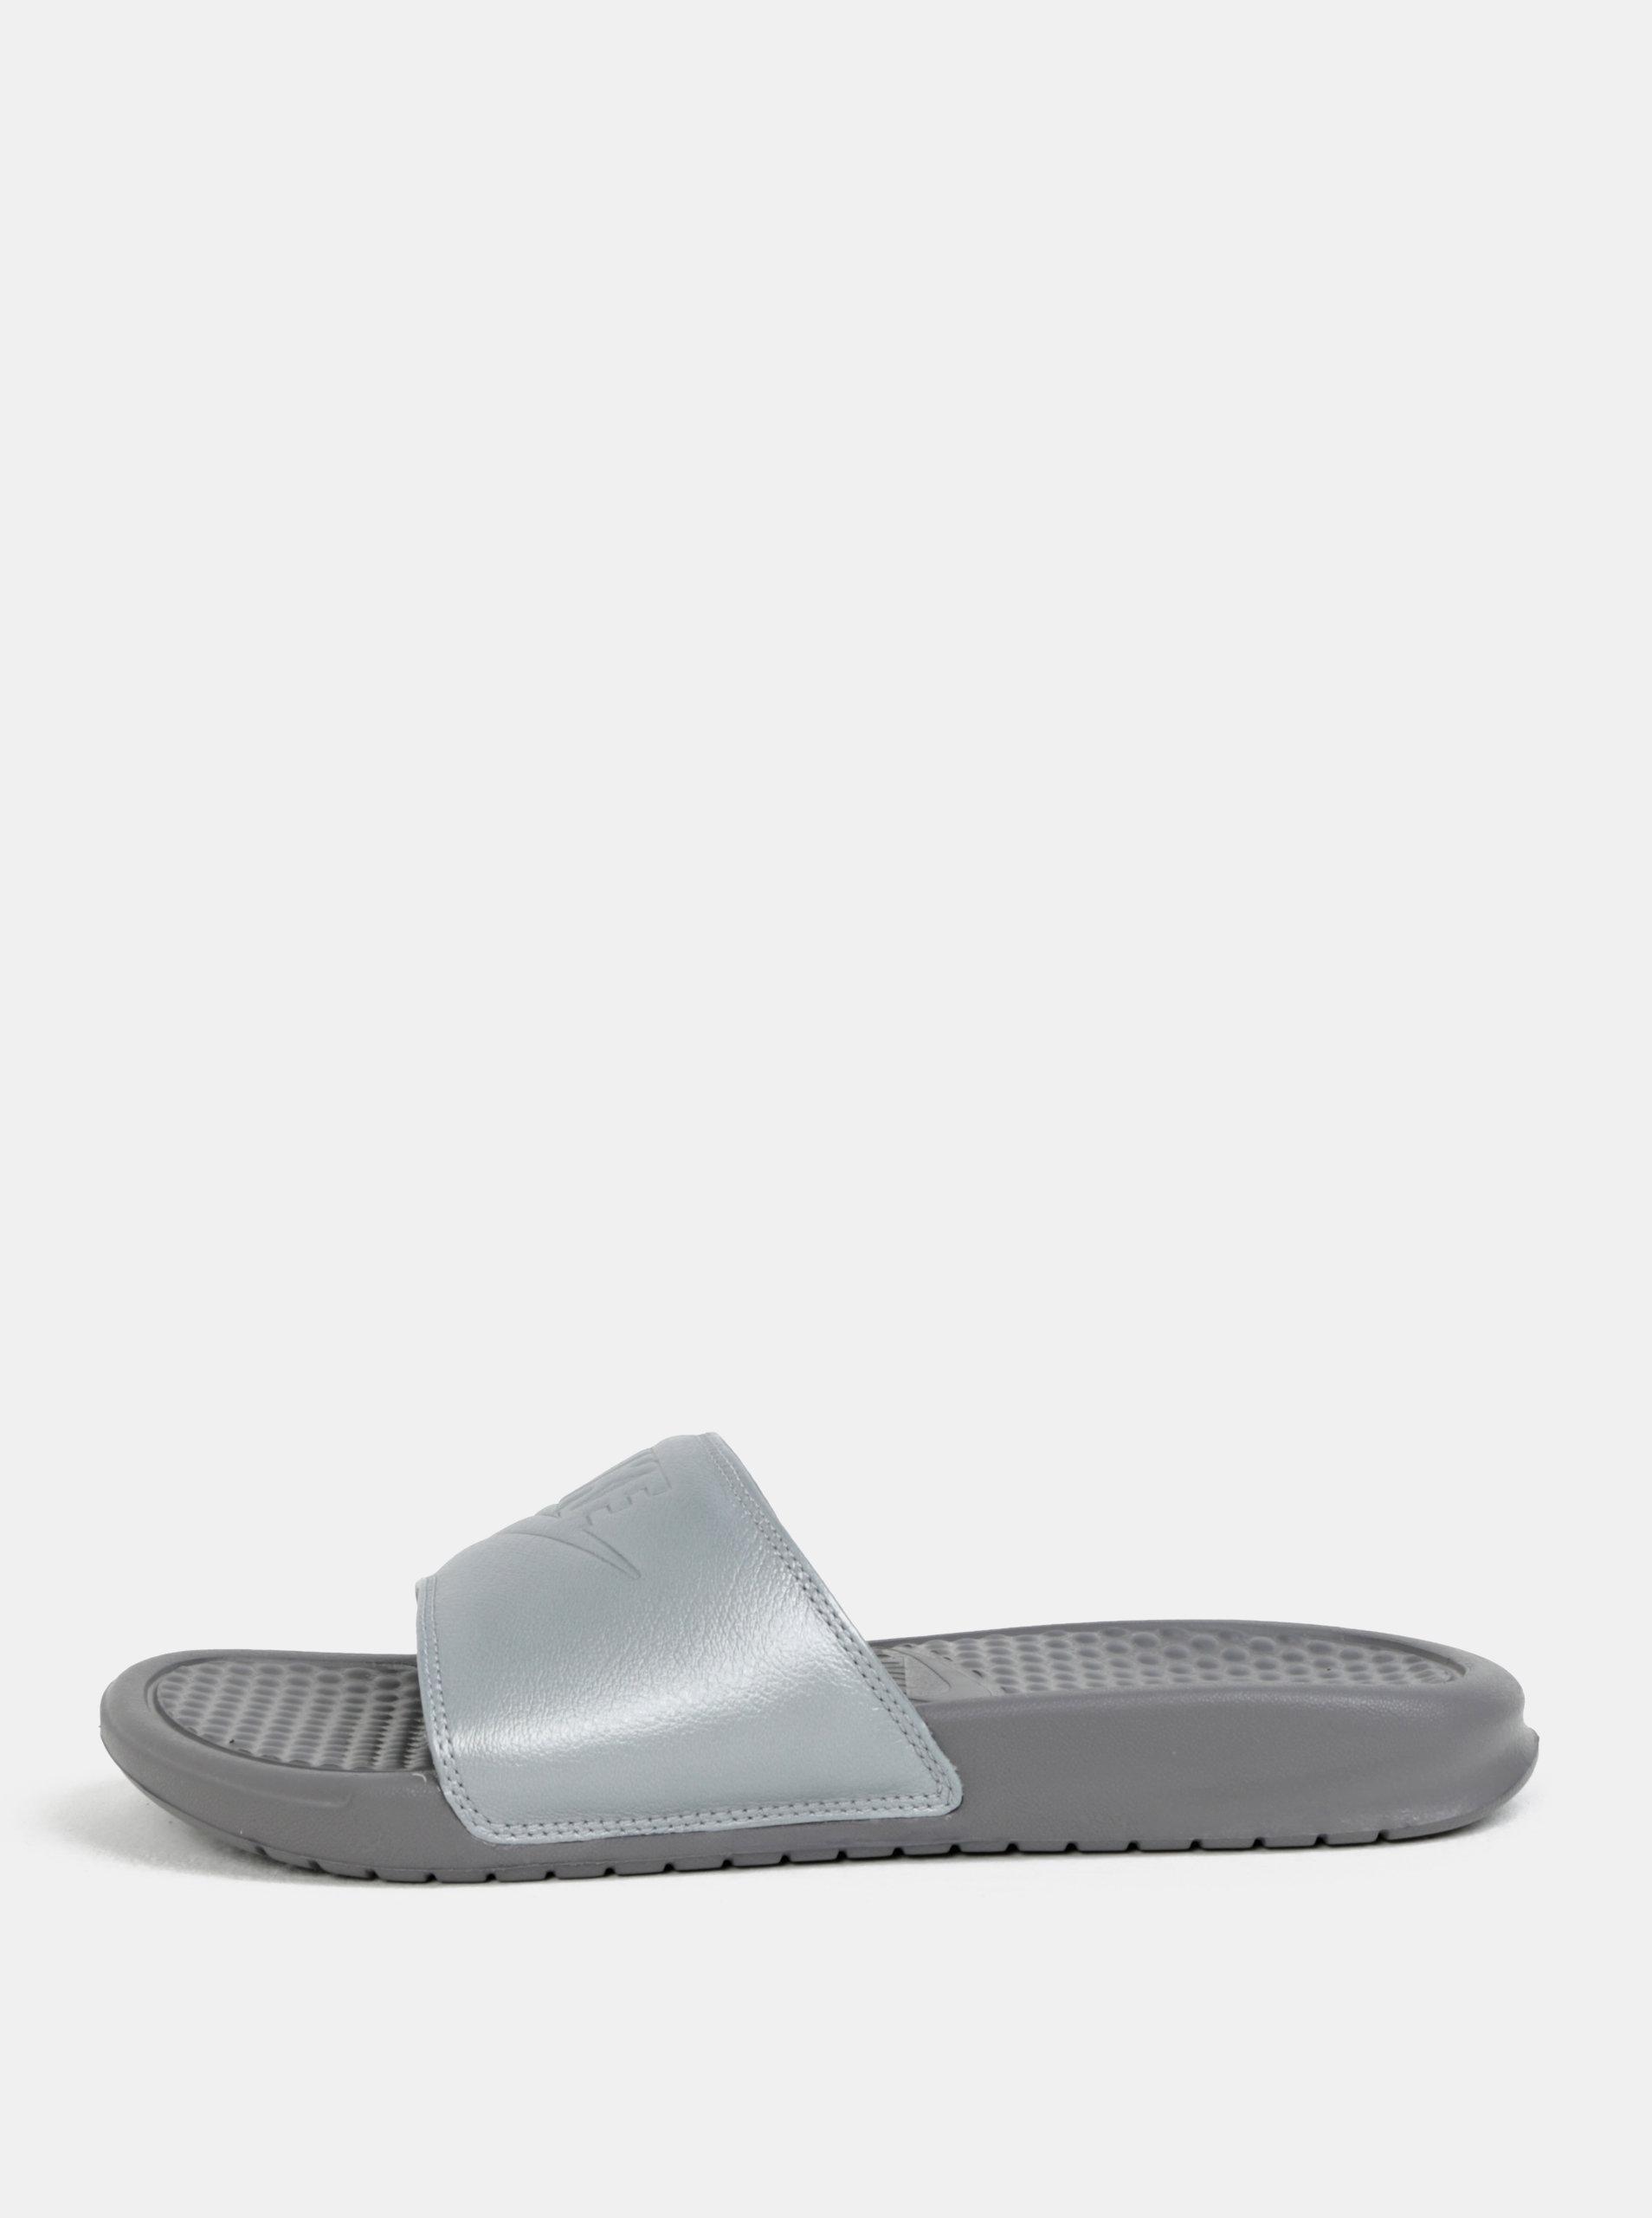 3f1c83ae68445 Sivé dámske šľapky Nike Benassi | ZOOT.sk